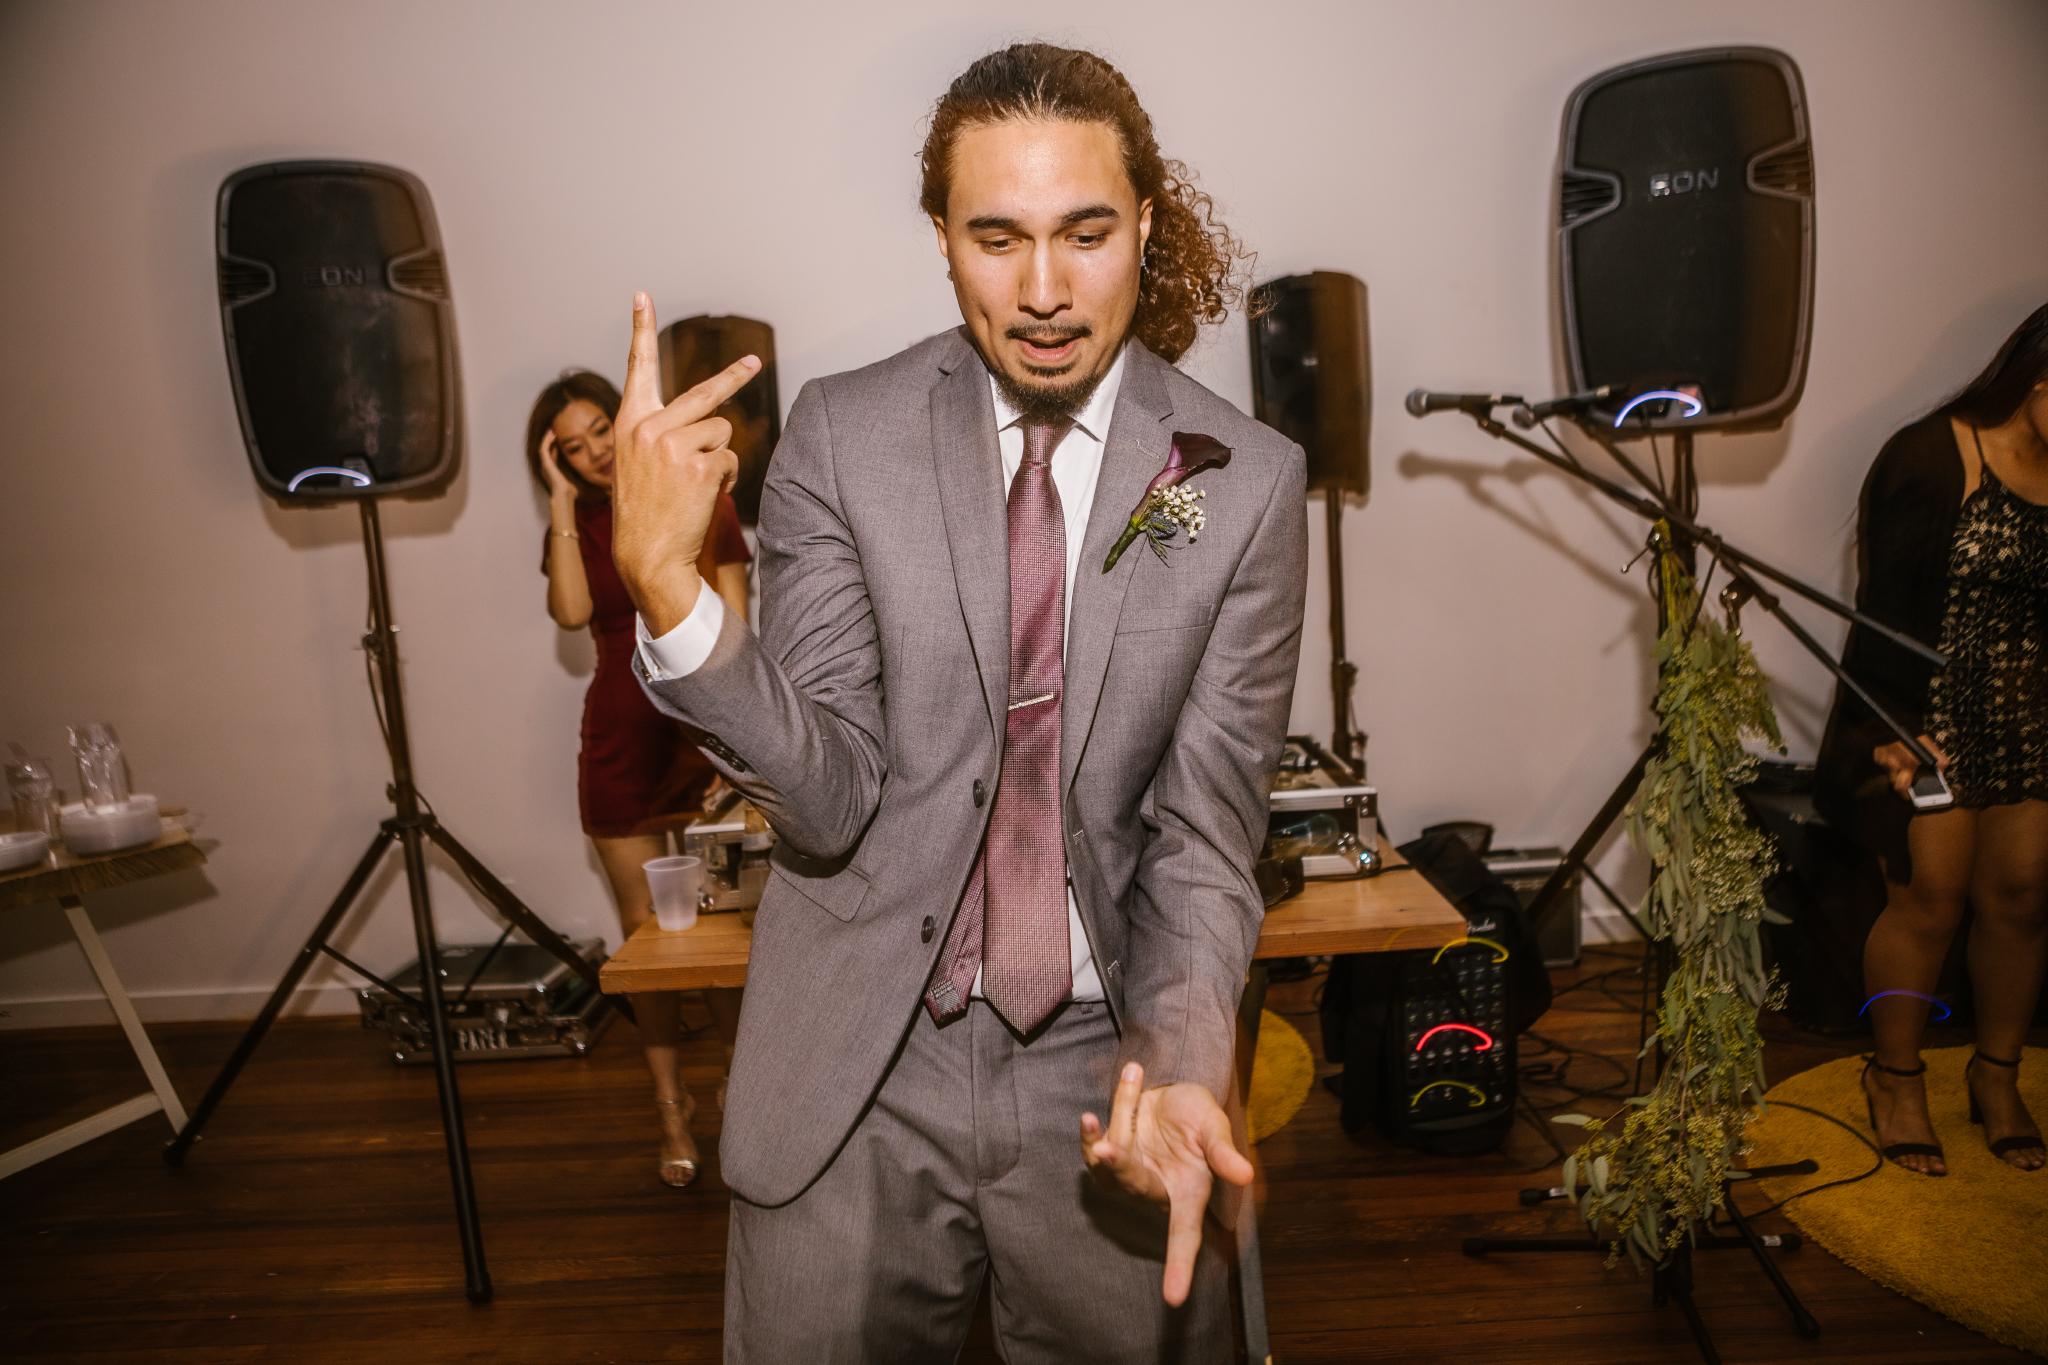 san diego wedding   photographer   man dancing in front of speakers